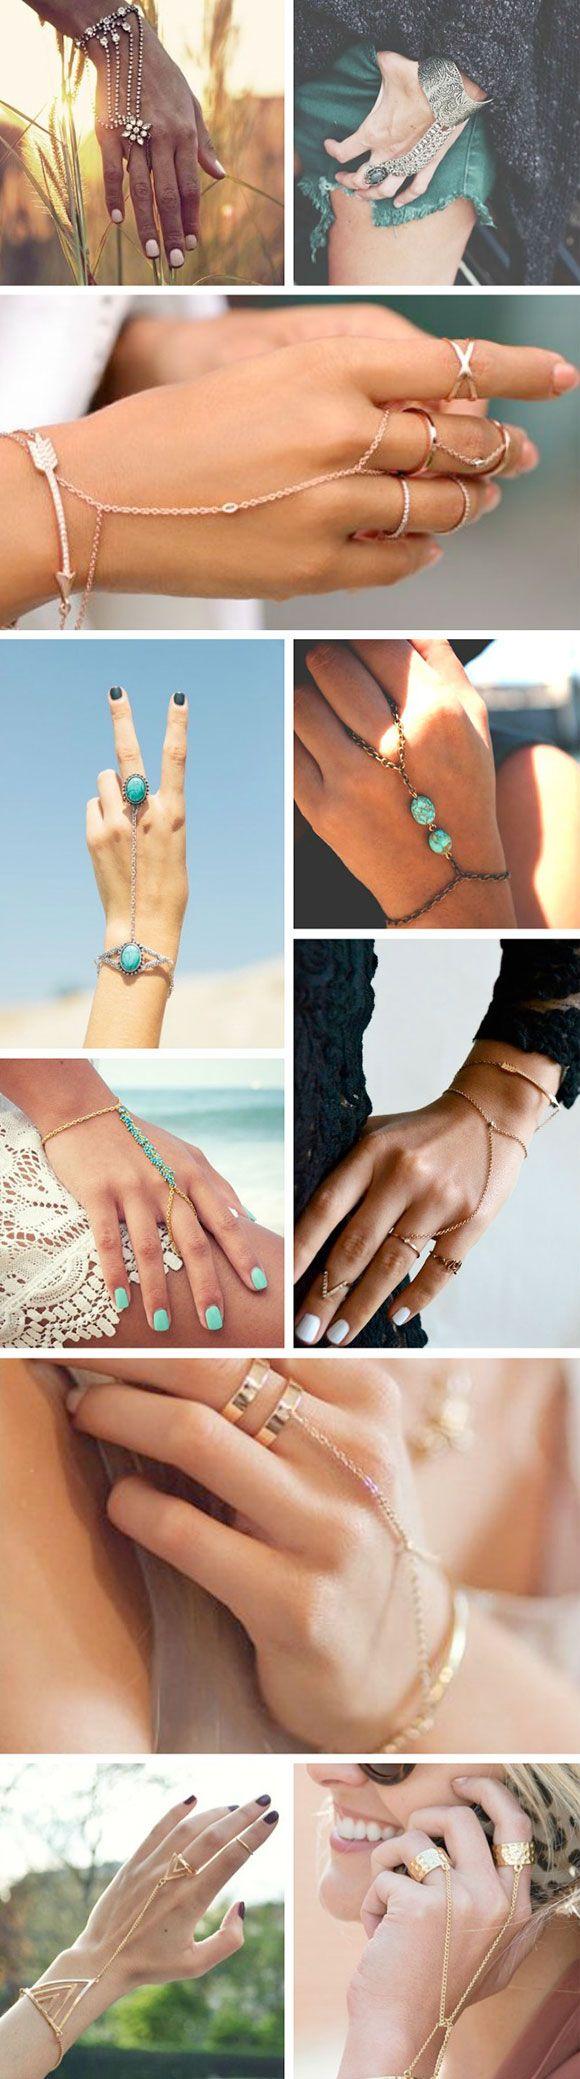 Trend: Hand Chain